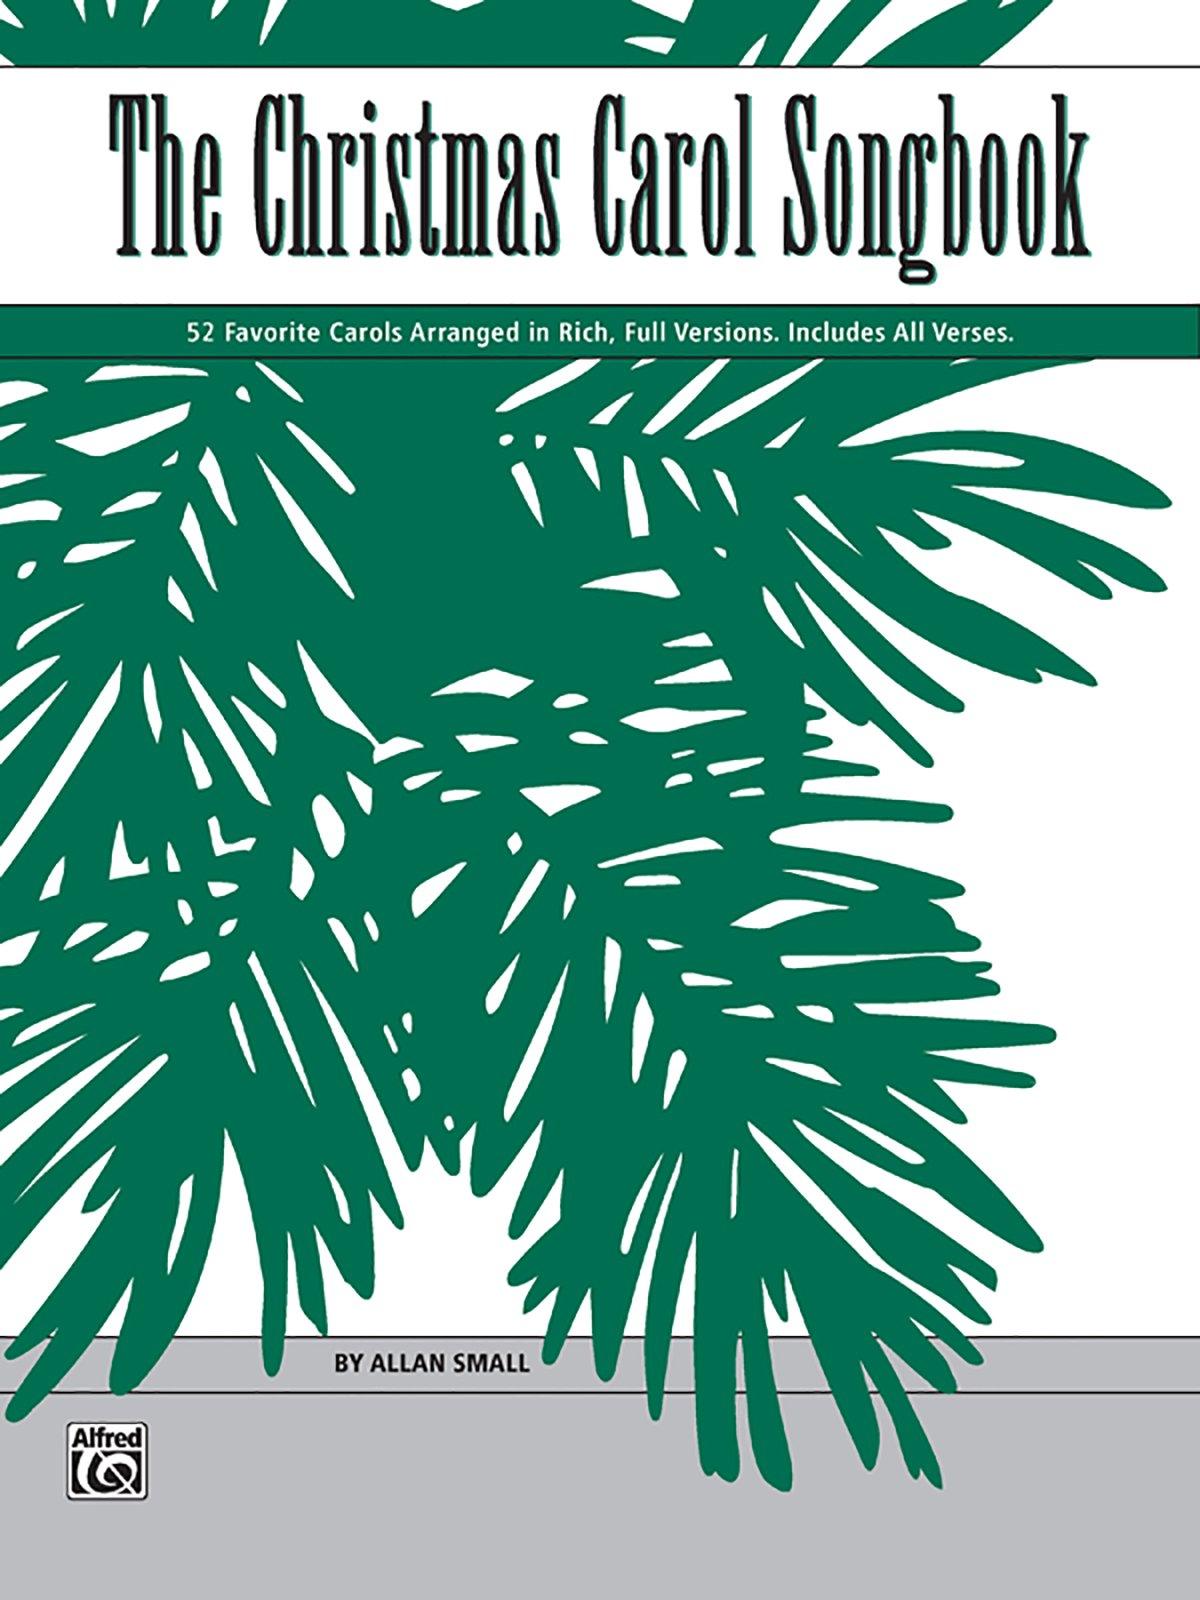 picture about Christmas Carol Songbook Printable identify Xmas Carol Songbook woestenhoeve